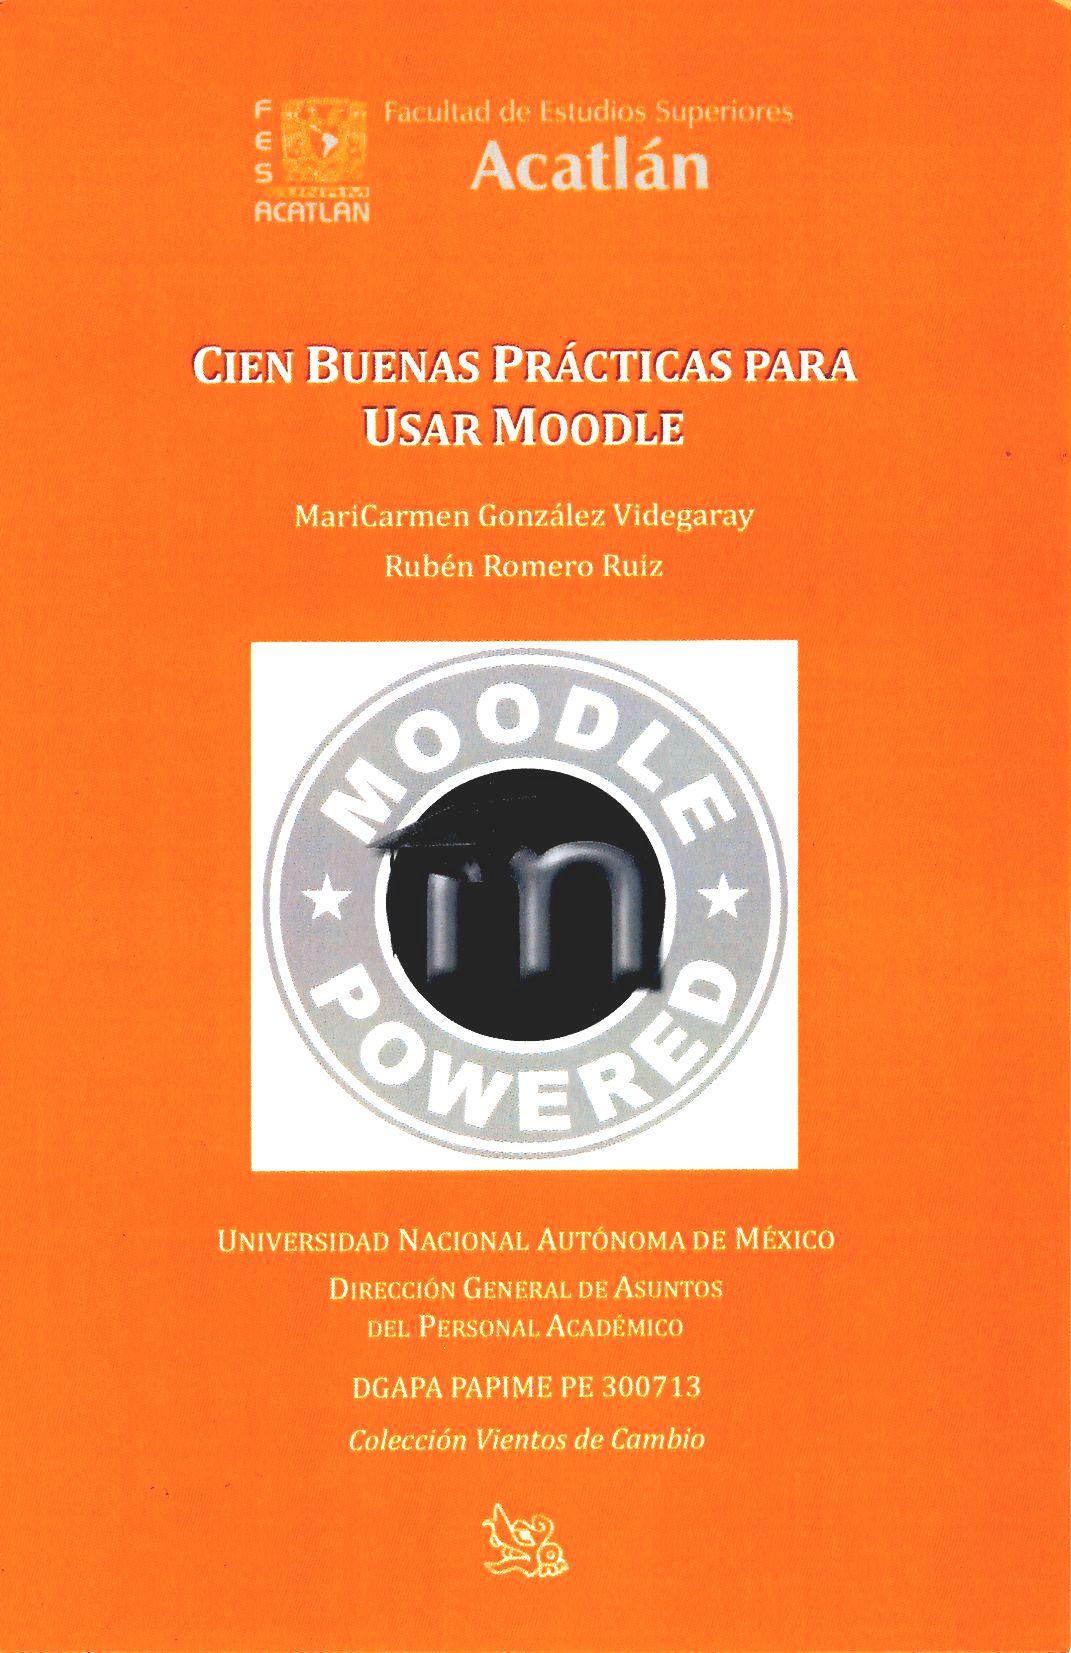 Cien buenas prácticas para usar Moodle